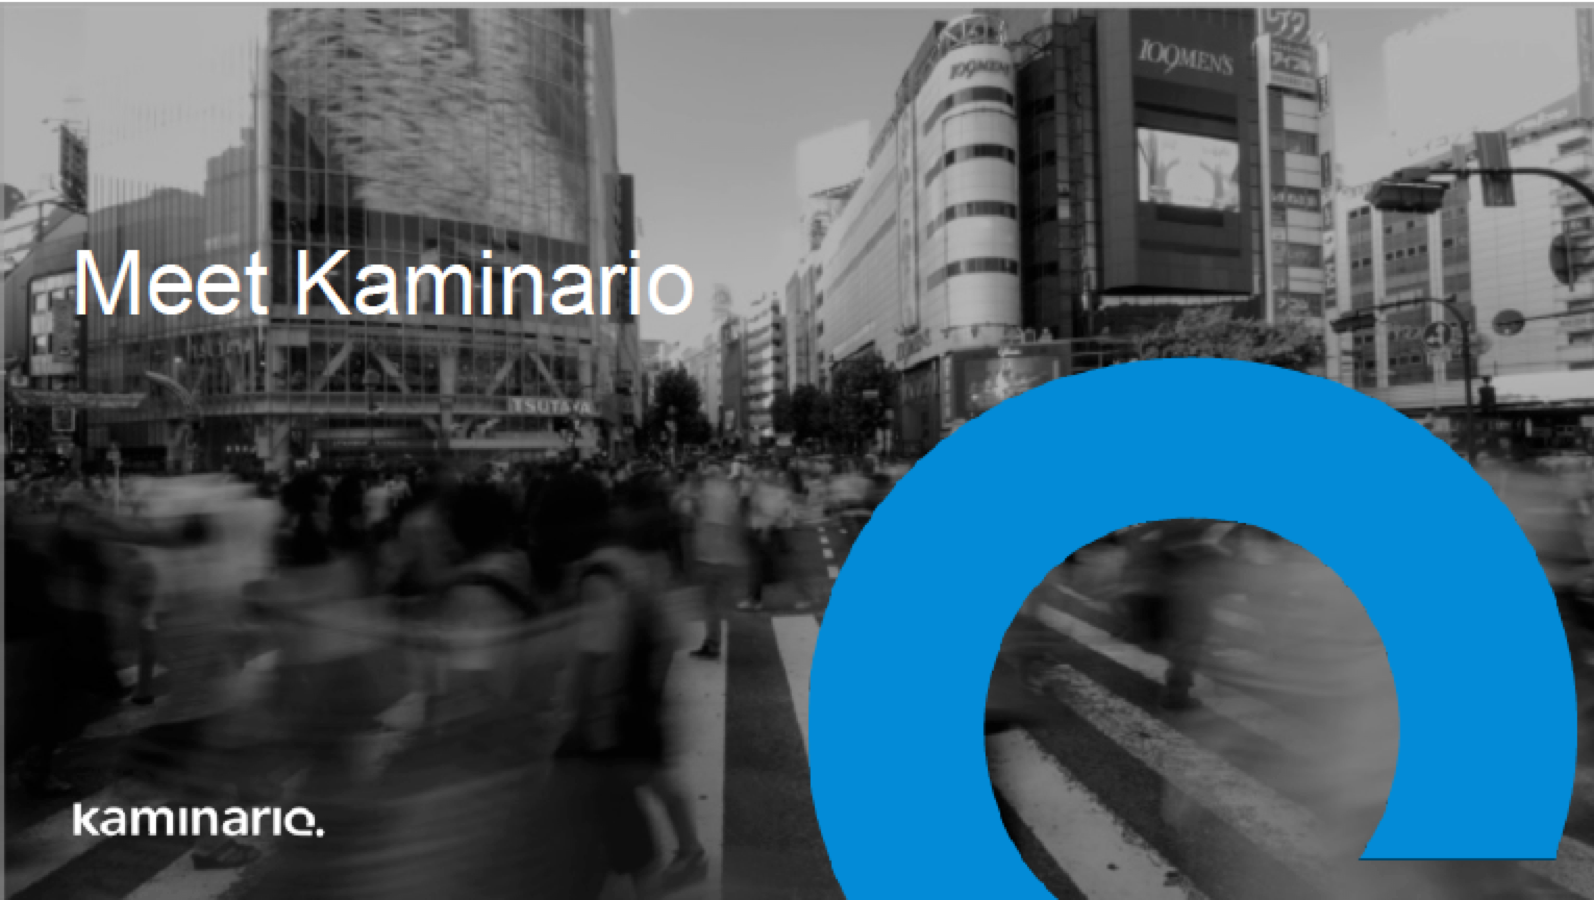 meet_kaminario_webinar_thumb.png